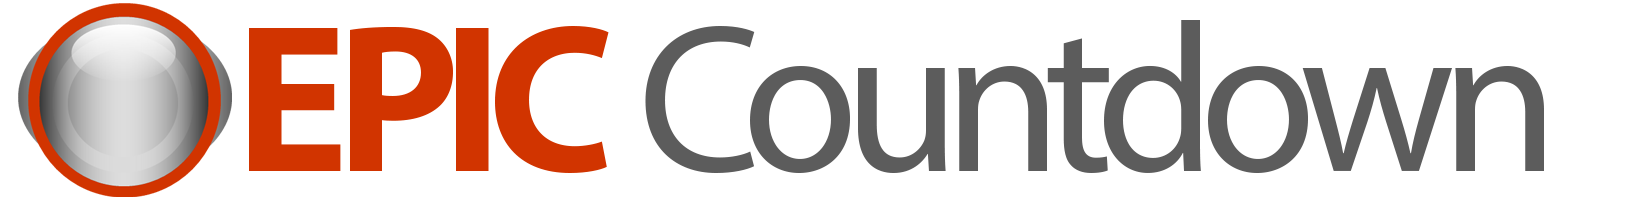 logo-epiccountdown-big